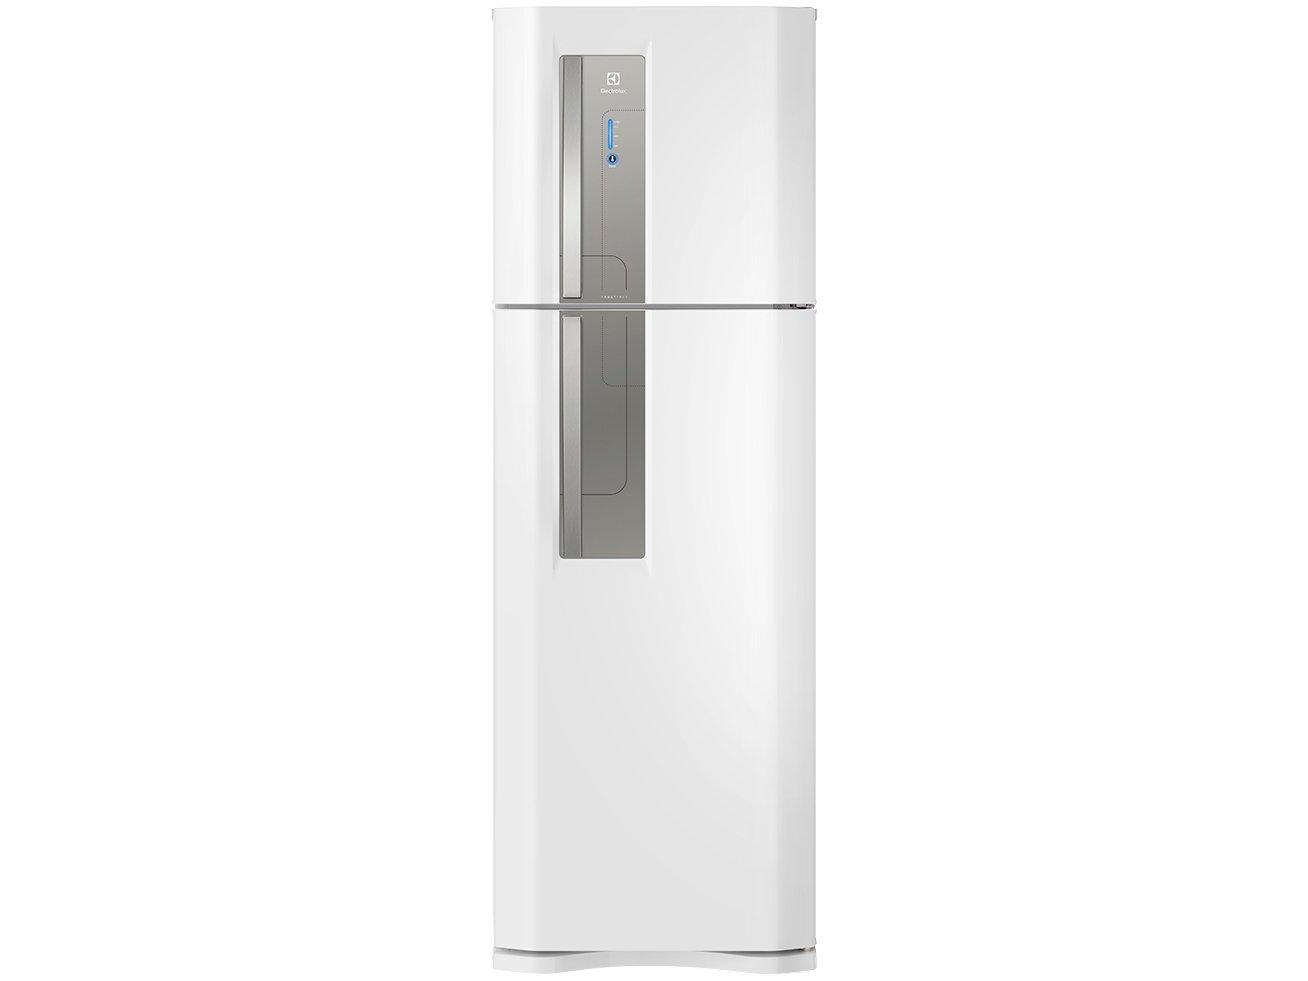 Geladeira/Refrigerador Electrolux Frost Free - Duplex Branca 382L TF42 - 110 V - 1